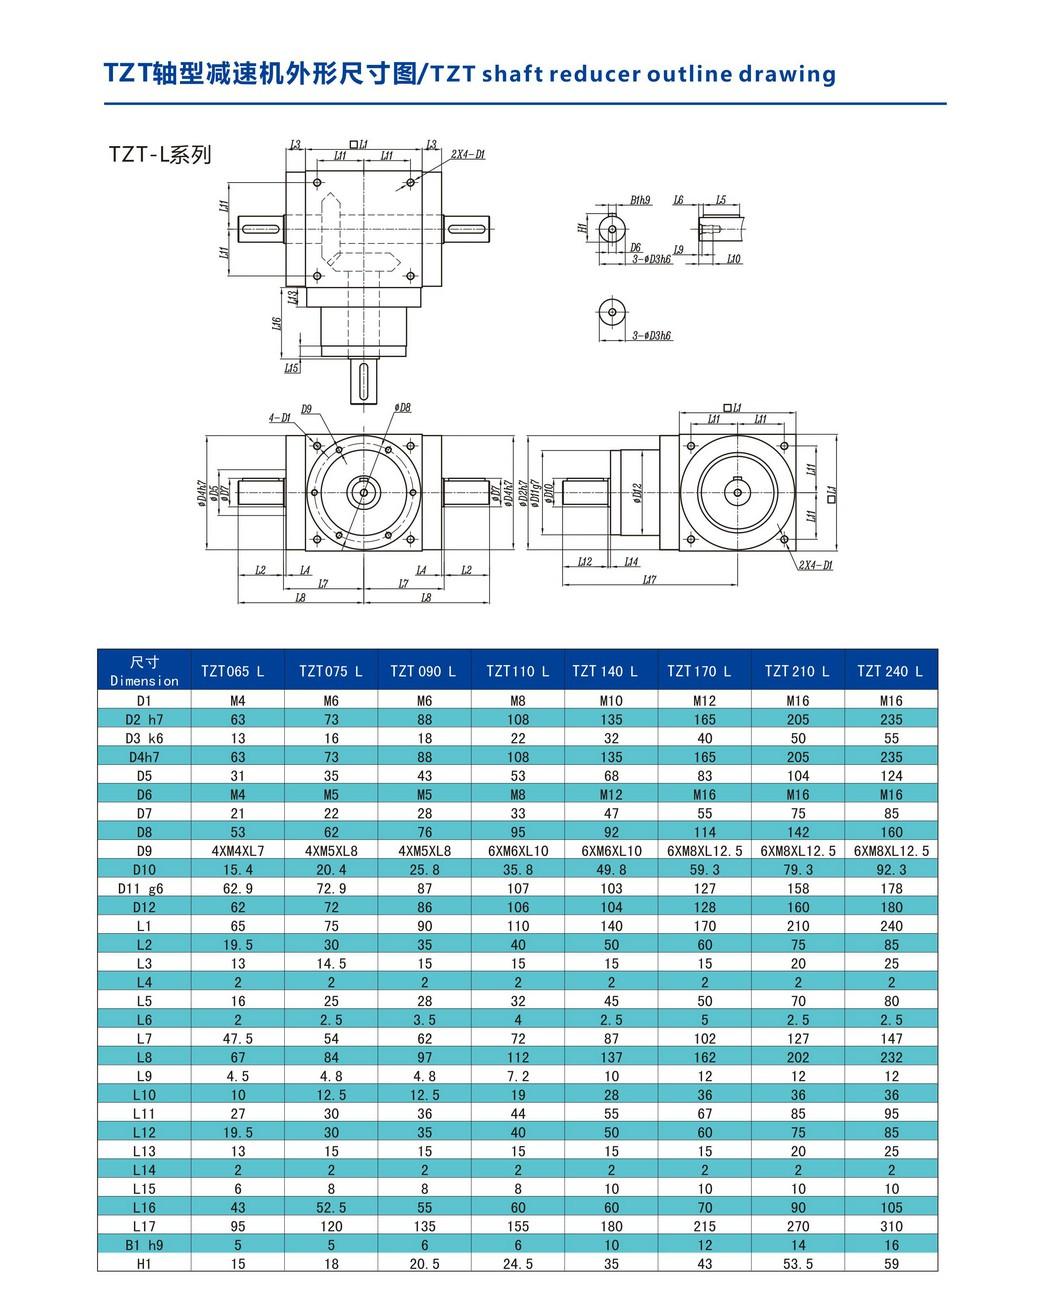 TZT-L轴型减速机外形尺寸.jpg